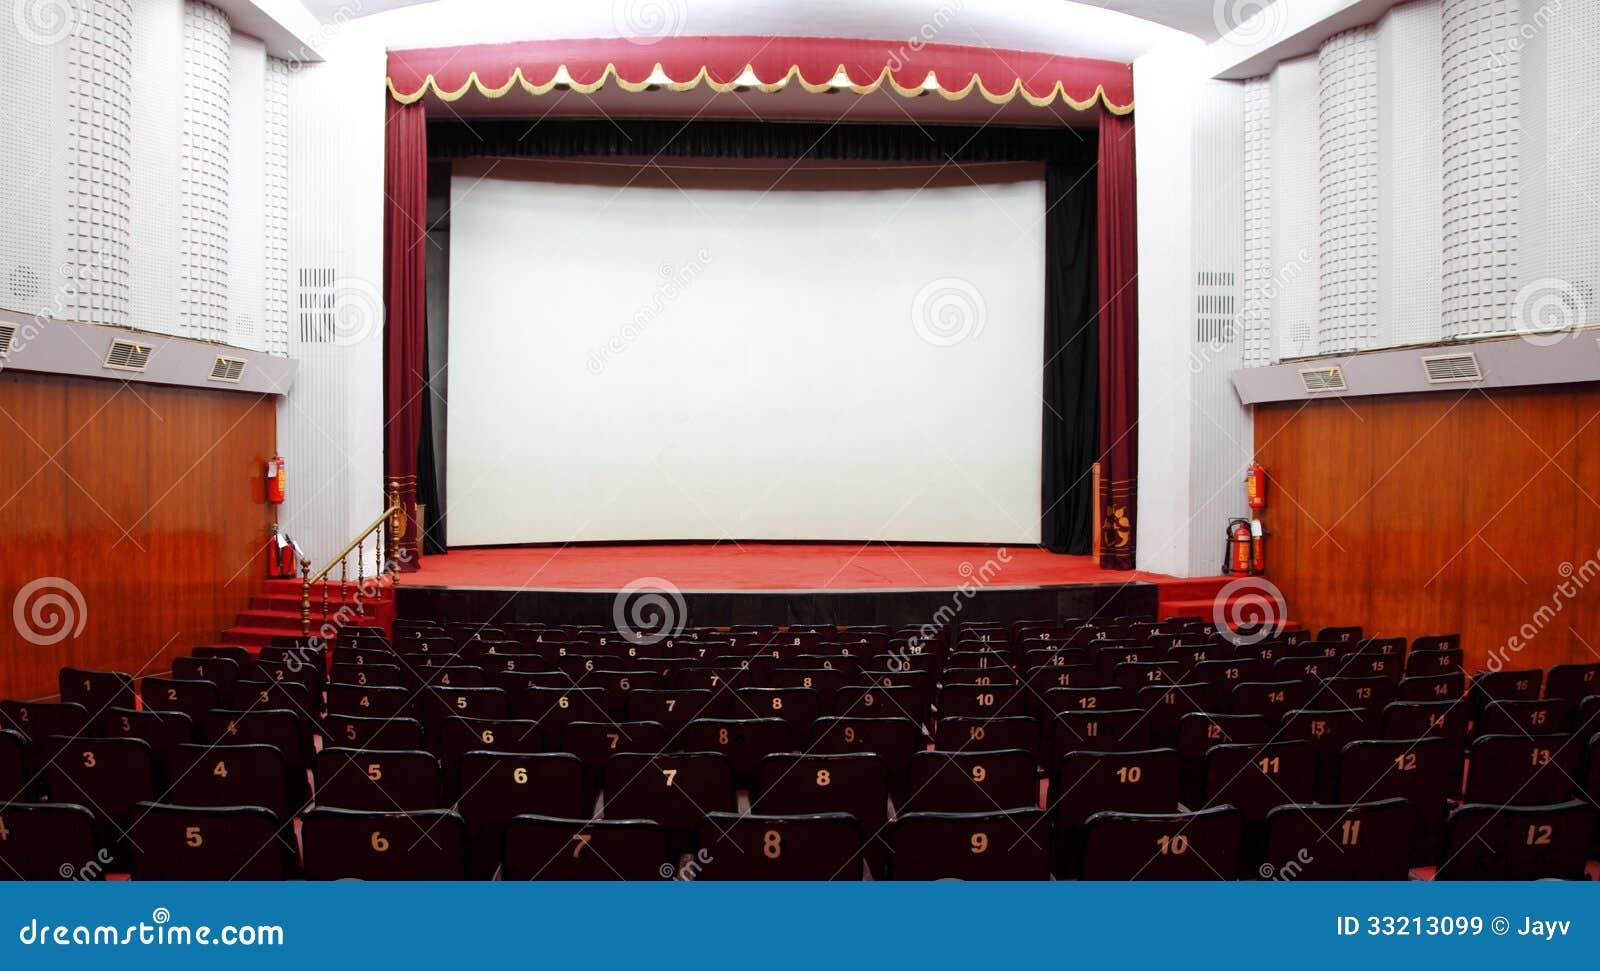 cinema hall stock image  image of cloth  backdrop  premiere